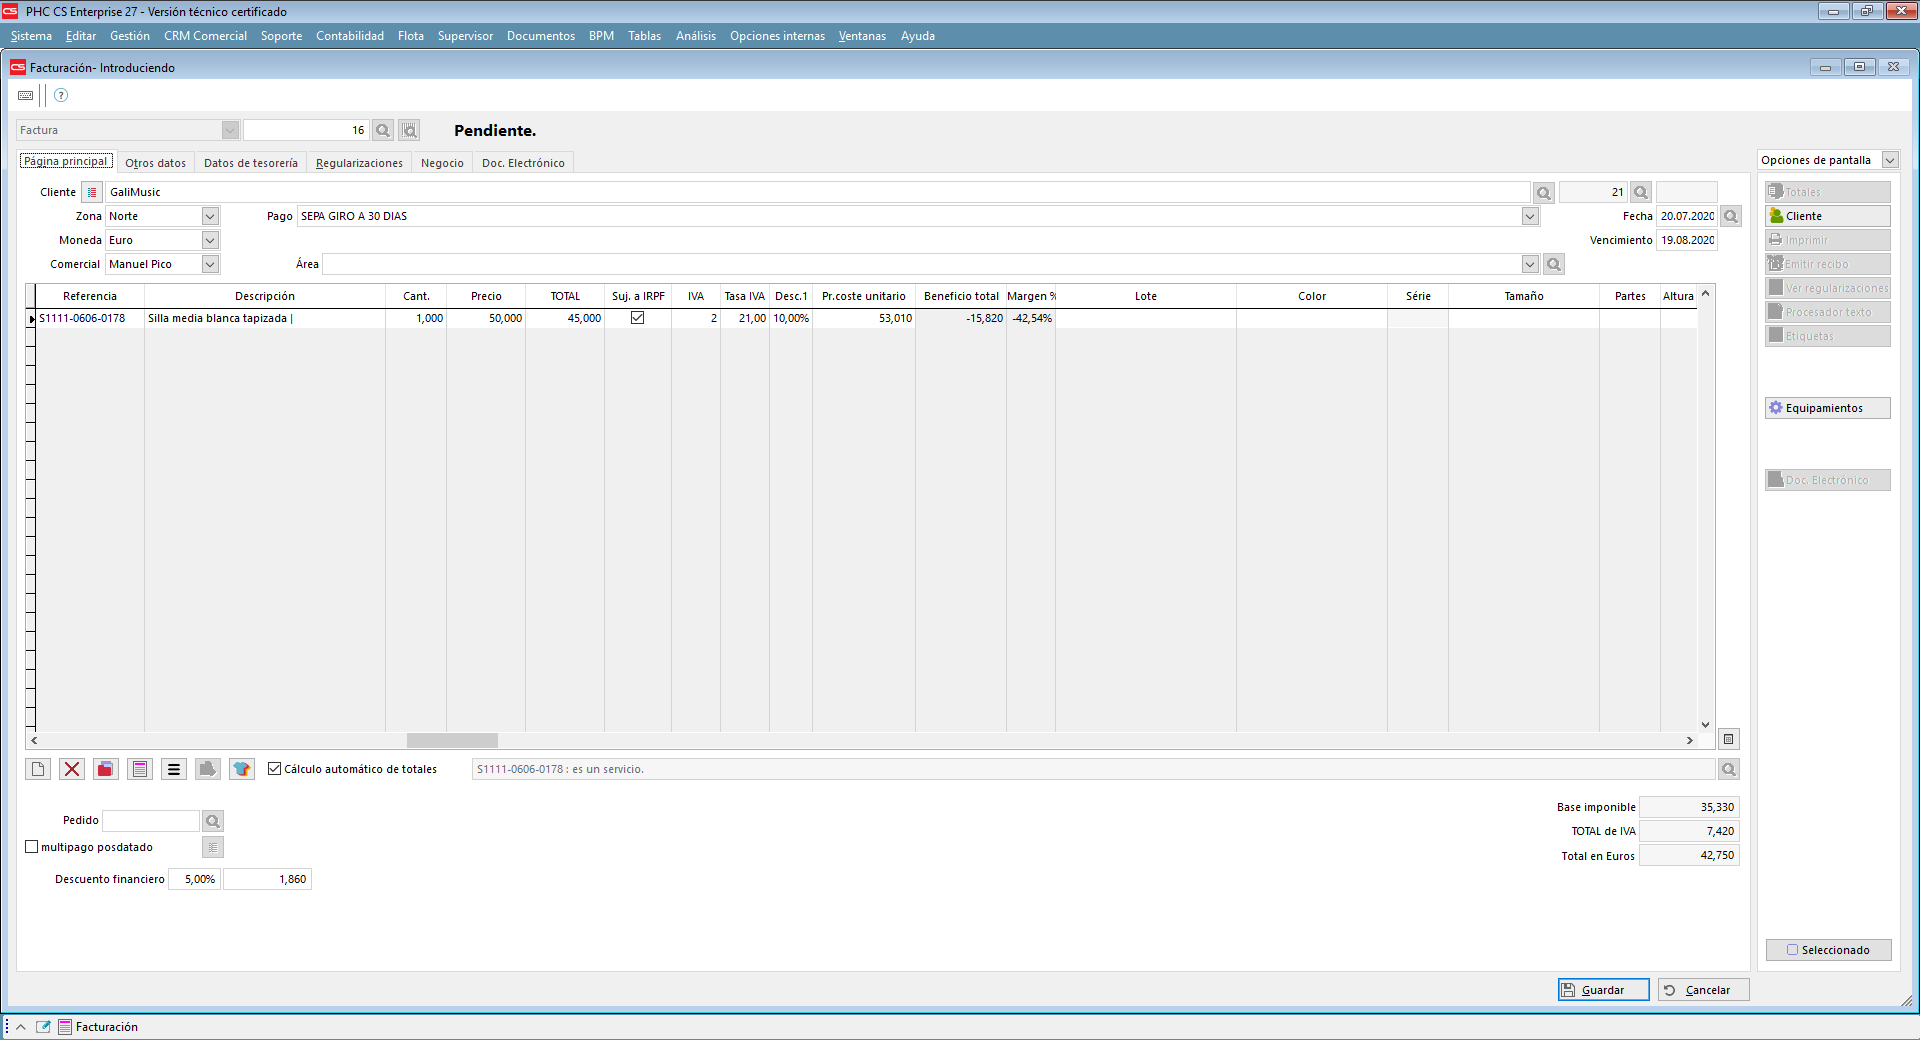 Documentos de facturación (con retención de IRPF) con software de gestión PHC